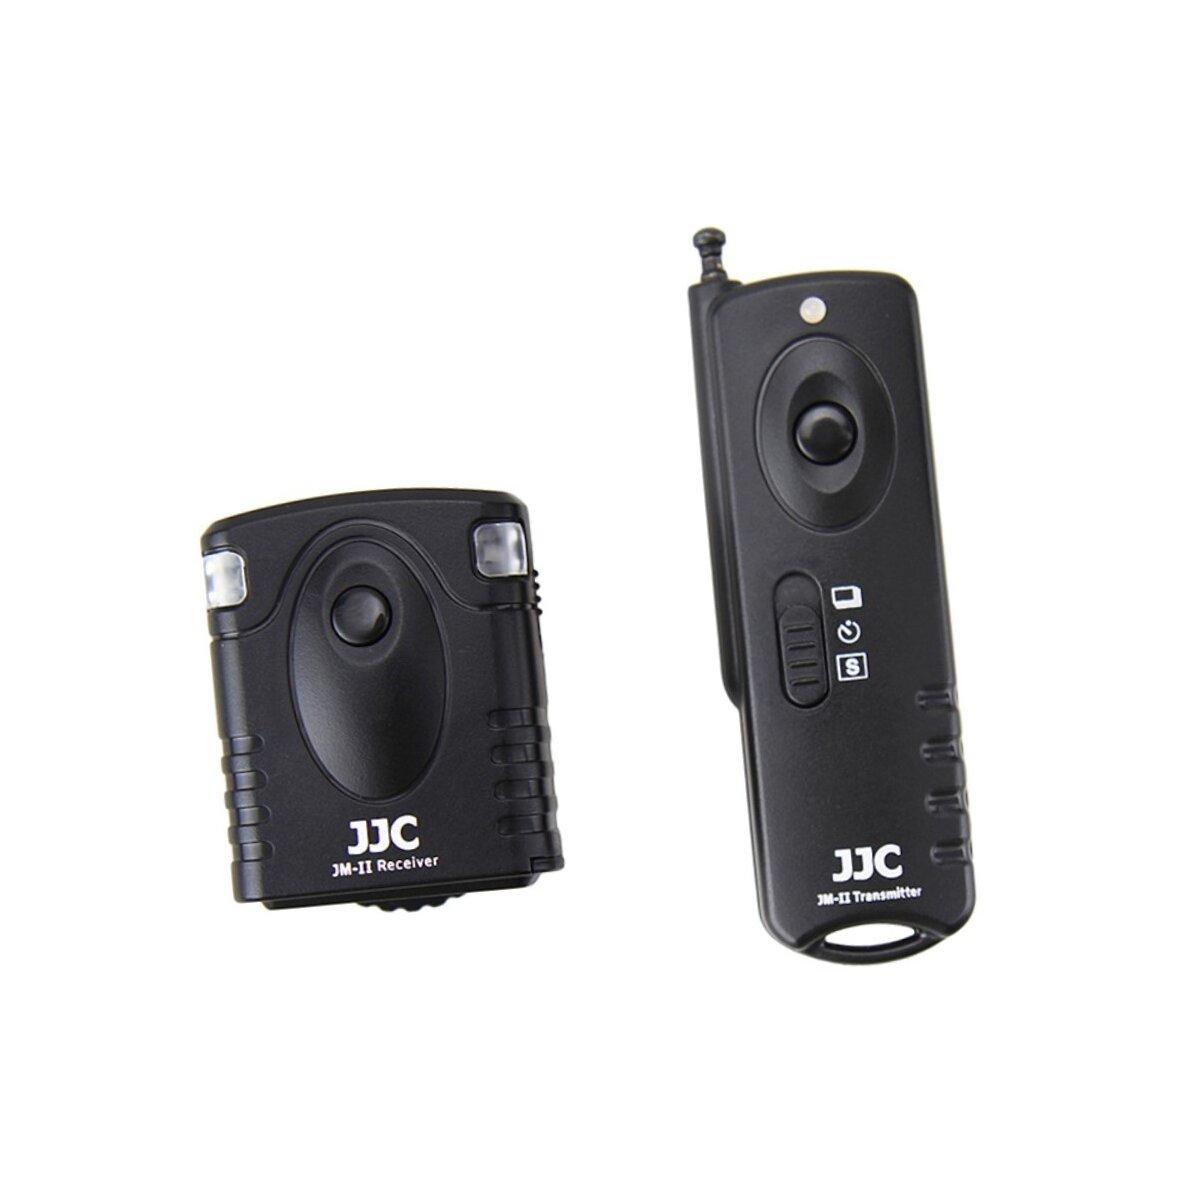 Impulsfoto Funk Fernauslöser für Nikon D90 D600 D610 D3100 D3200 D3300 D5000 D5100 D5200 D5300 D5500 D5600 D7000 D7100 D7200 D7500 Df P7700 P7700 P7800 Z 5 Z6 Z6II Z7 Z7II P1000